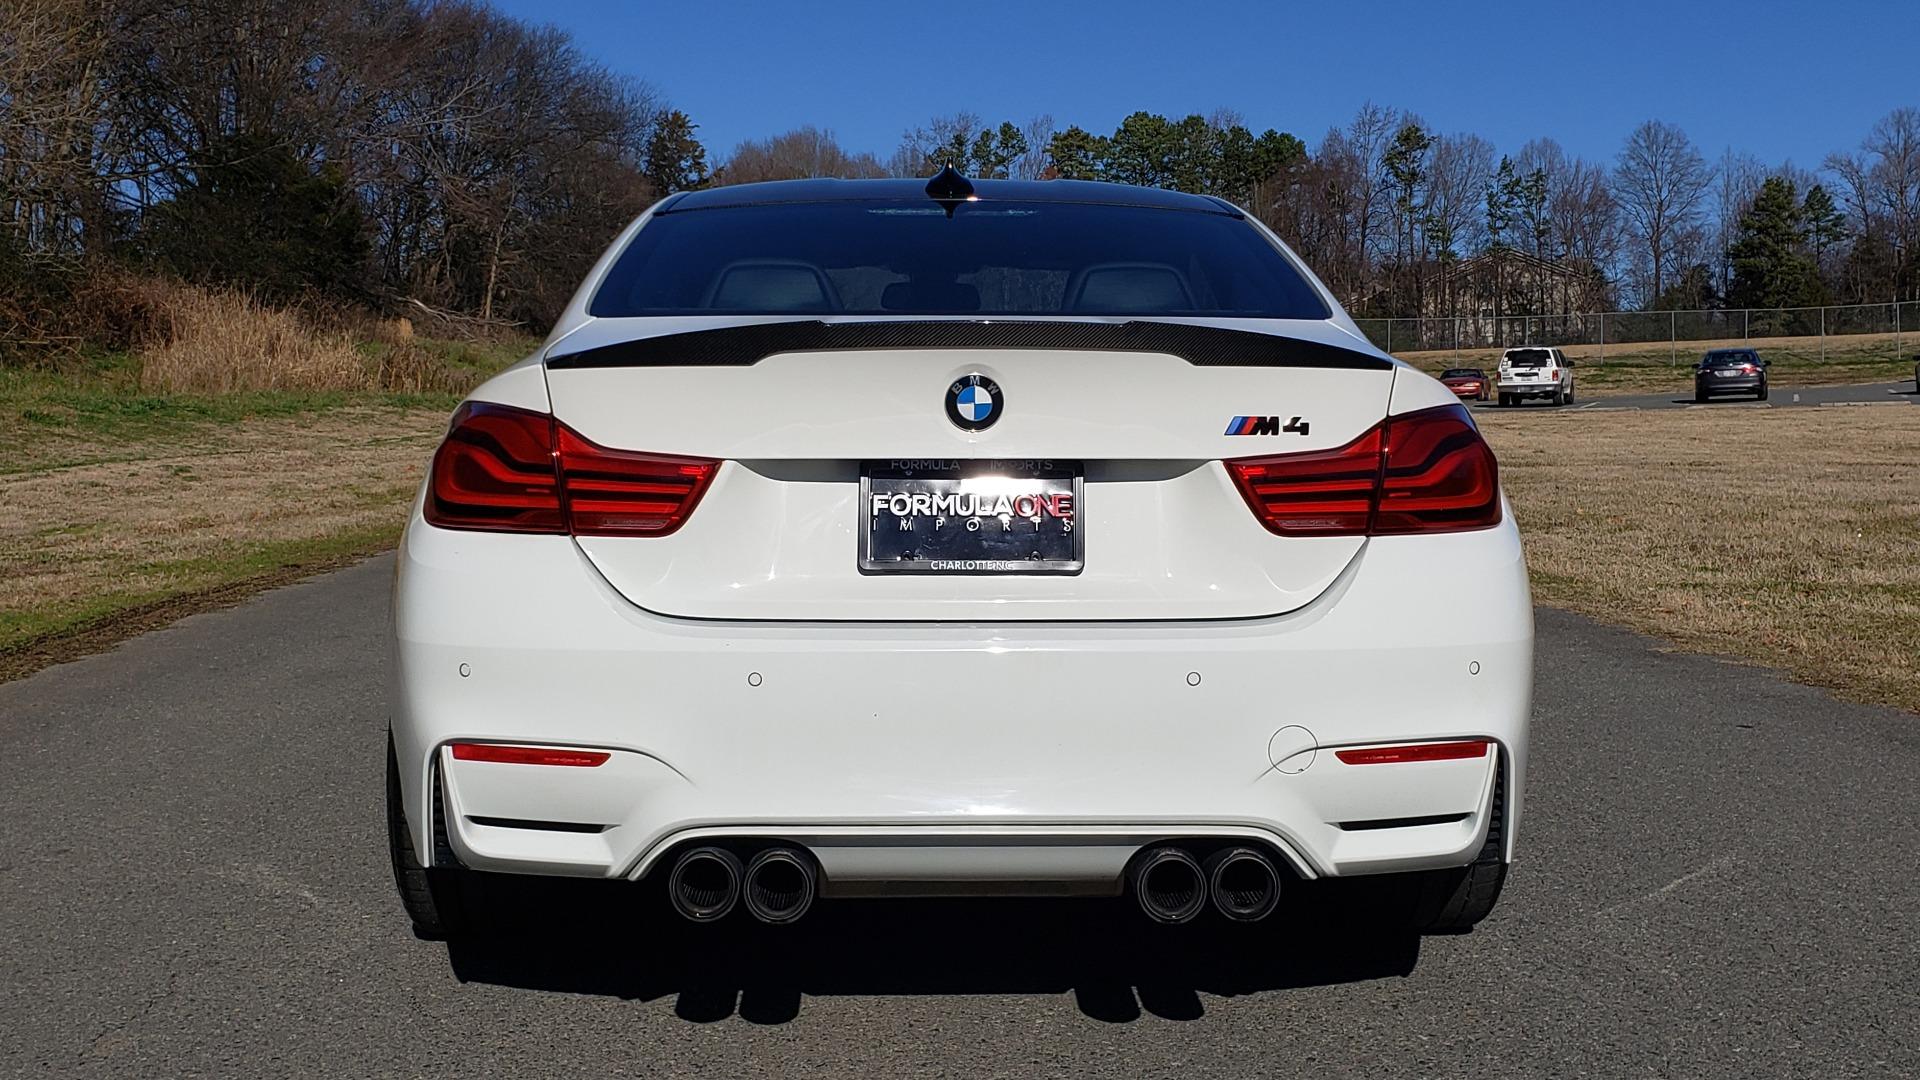 Used 2018 BMW M4 COMP PKG / EXEC / M-DRIVER / PARK CNTRL / ACTIVE BLIND SPOT for sale Sold at Formula Imports in Charlotte NC 28227 27